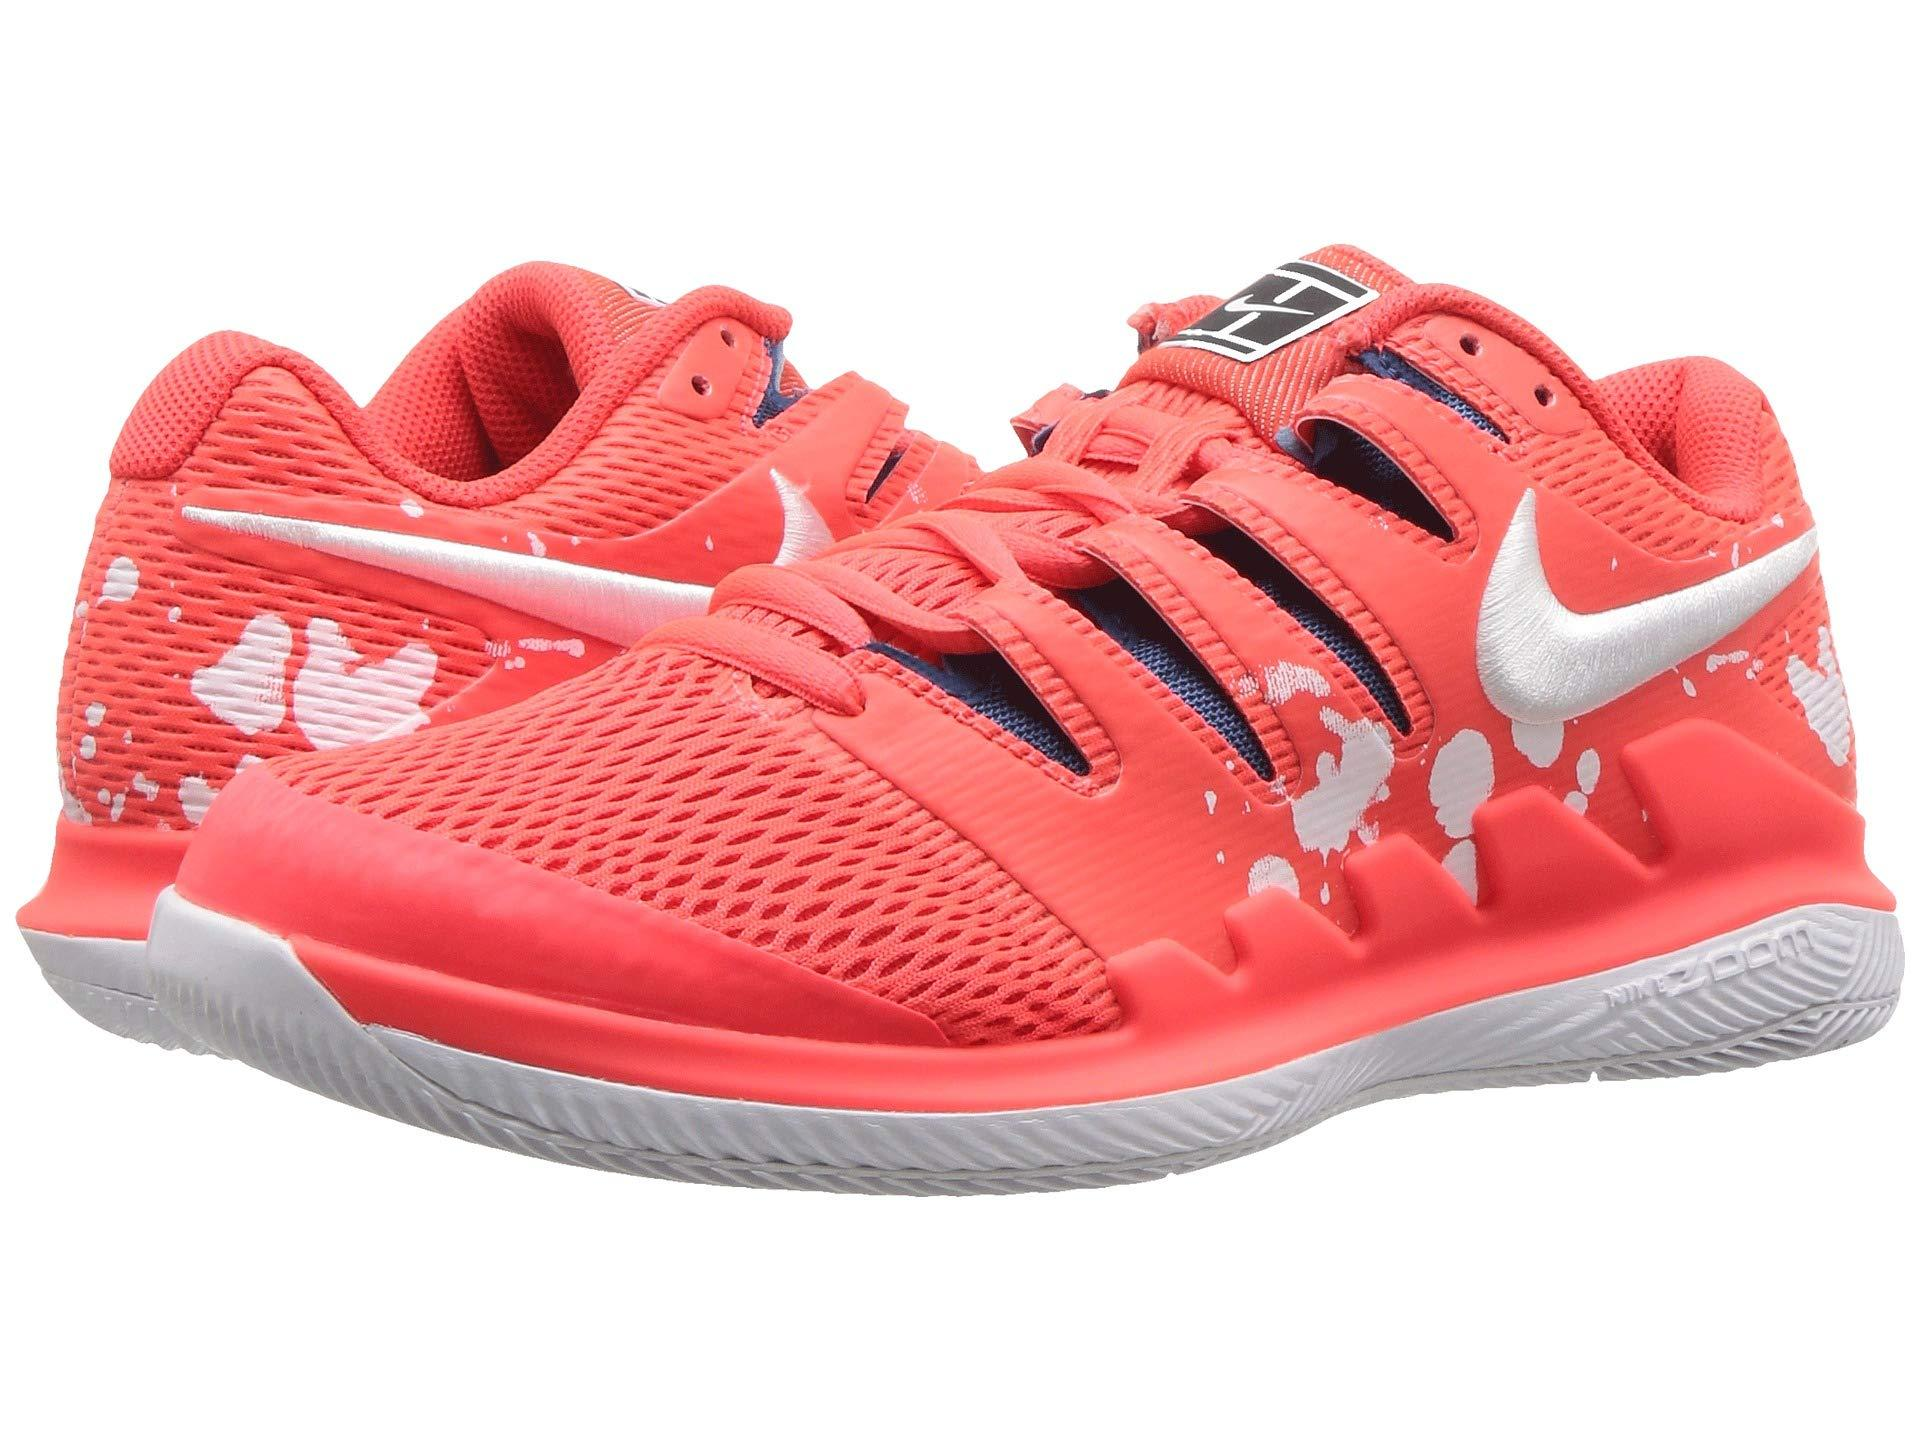 391e1a4806471 Lyst - Nike Air Zoom Vapor X (half Blue indigo Force pink Blast ...